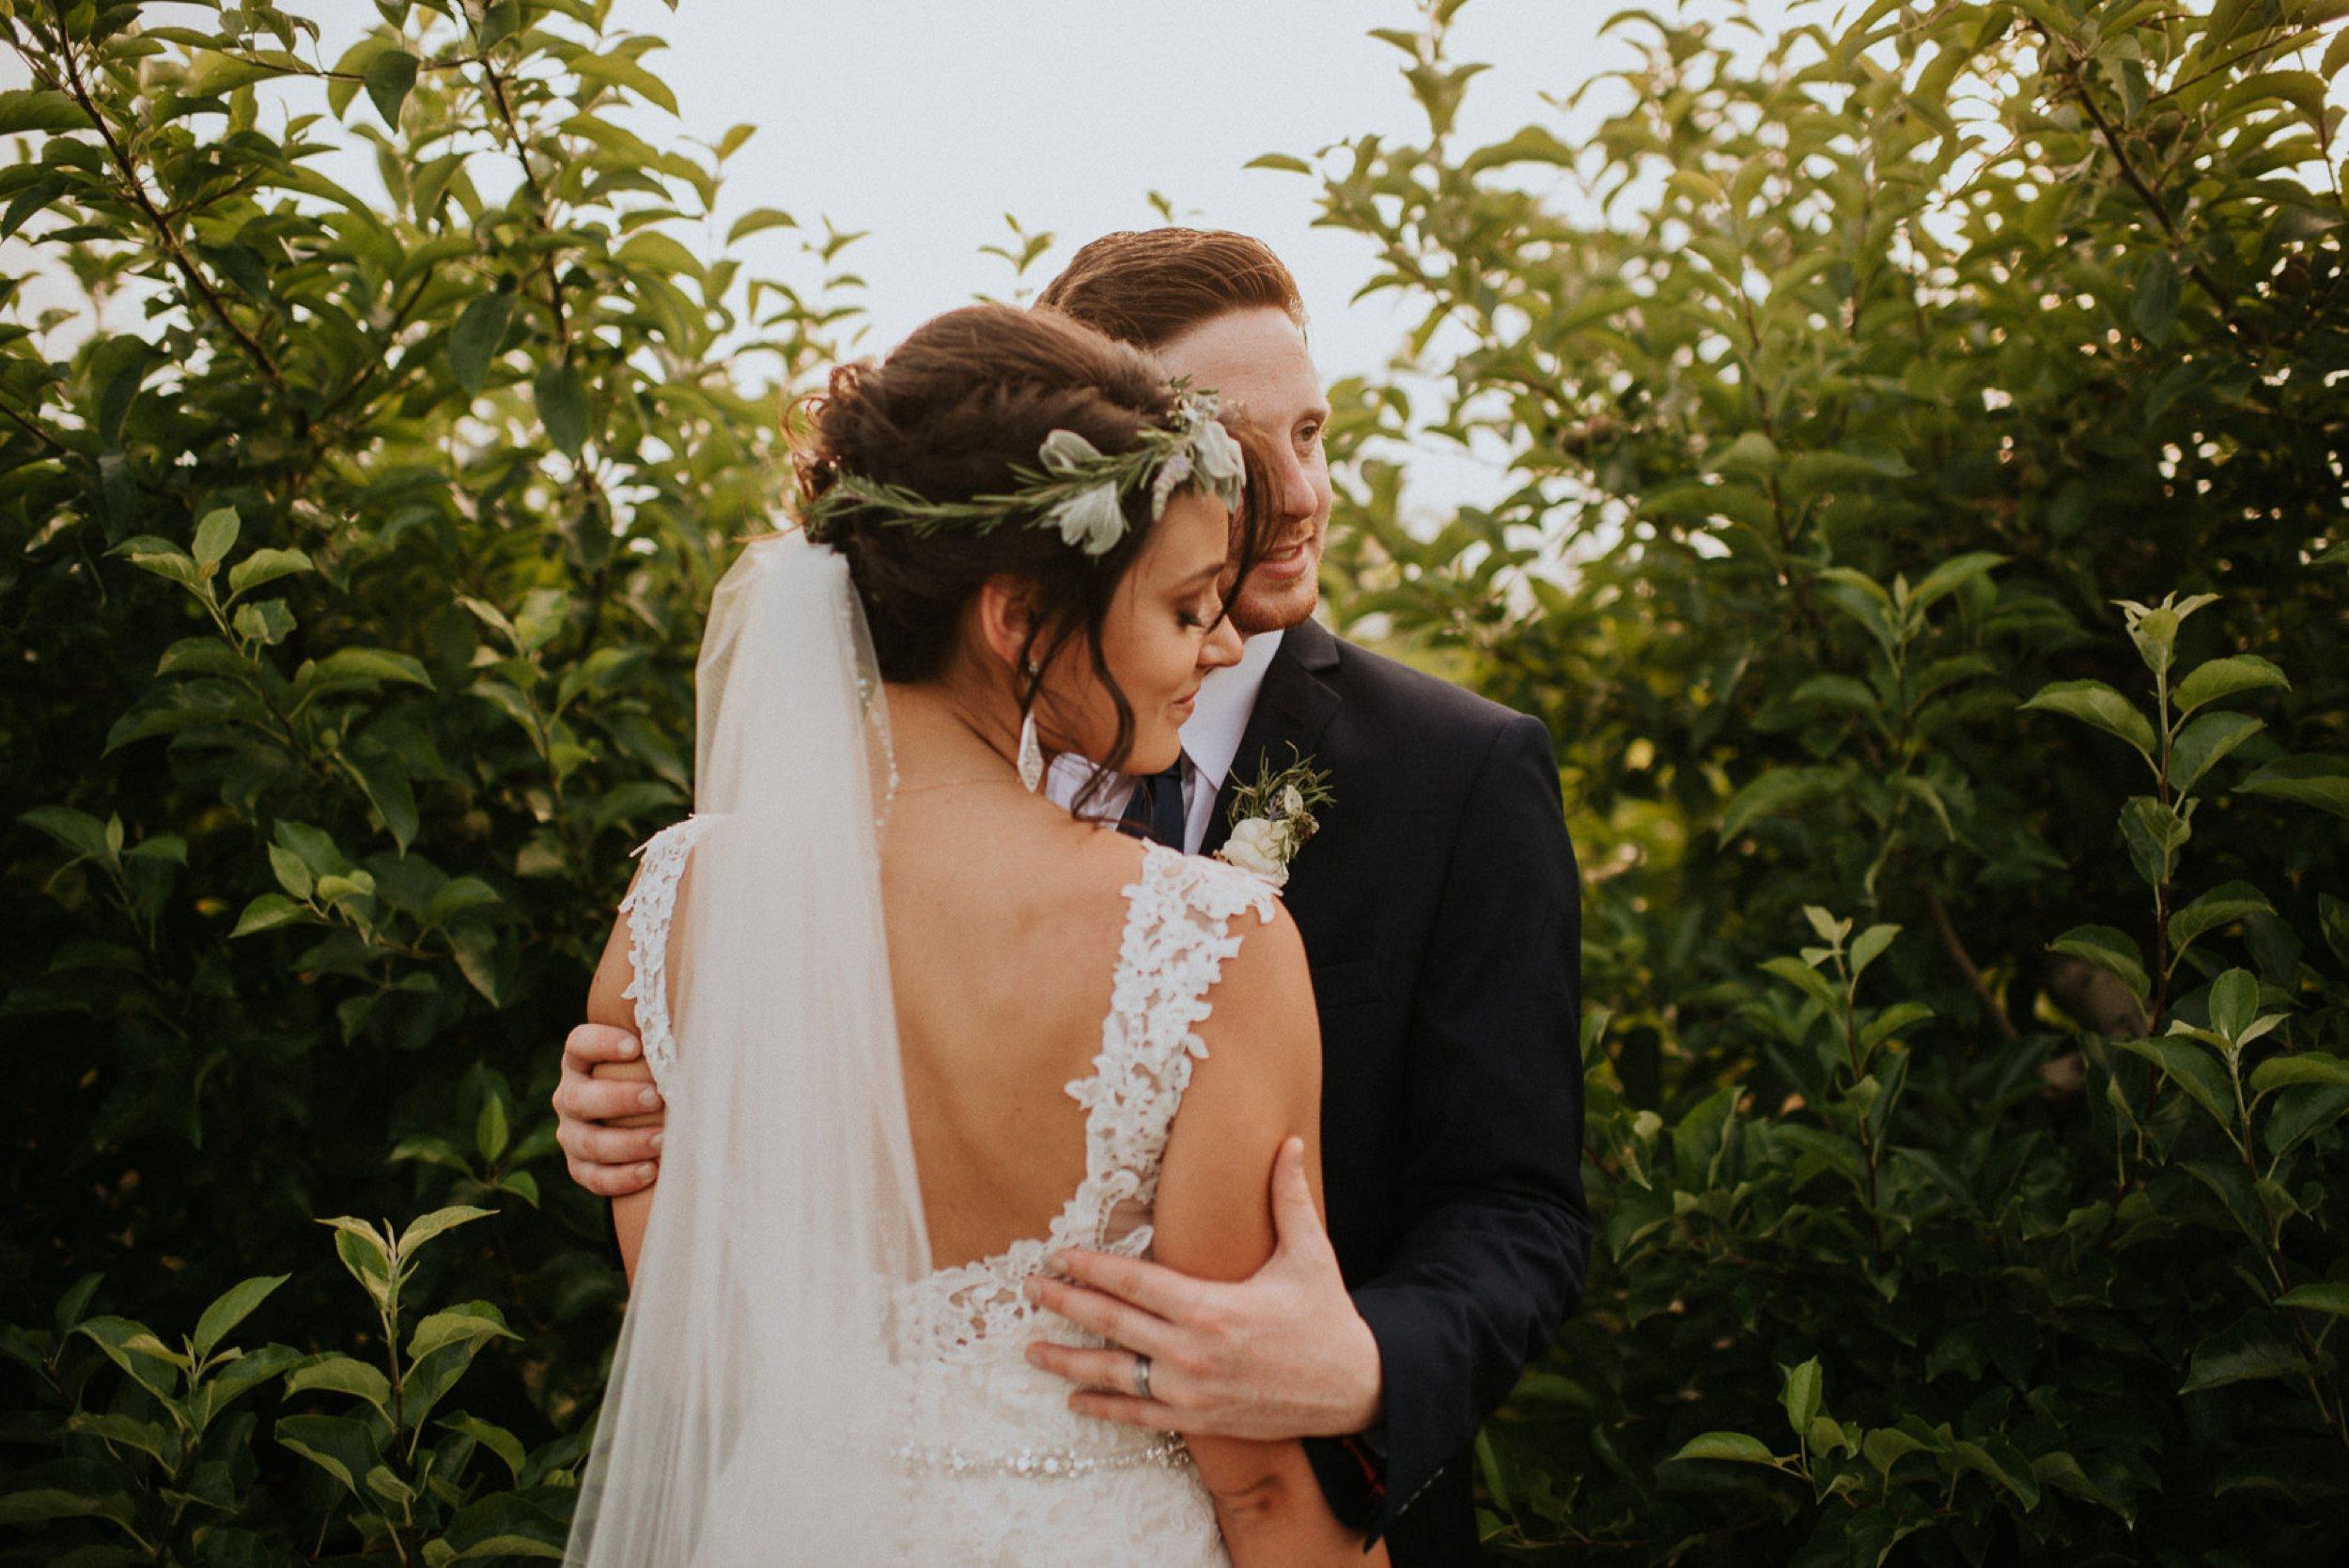 milburn_farms-wedding-65.jpg